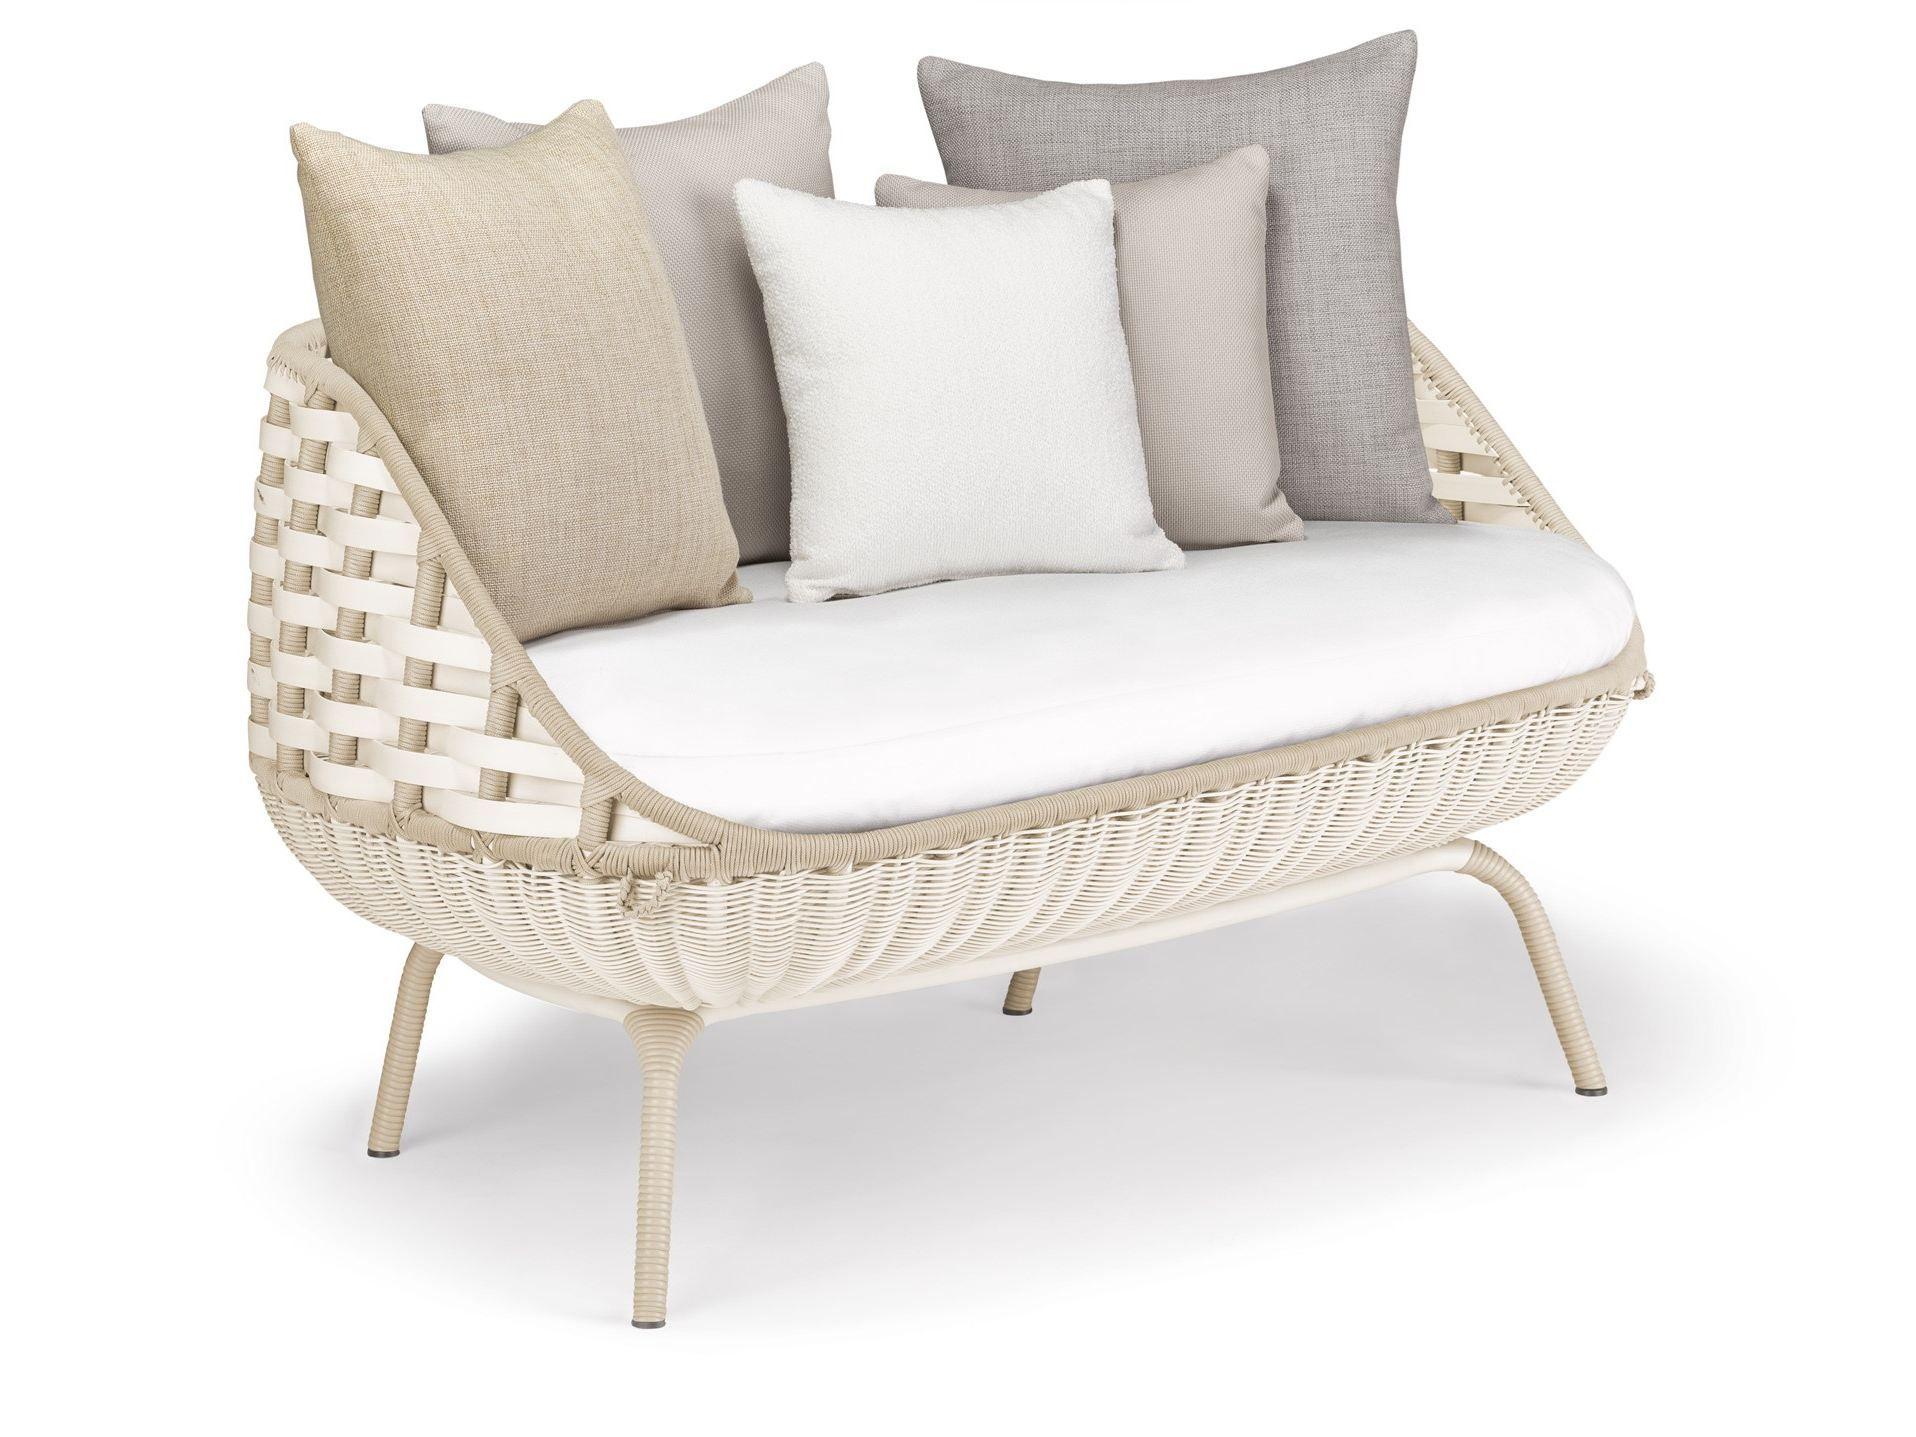 SWINGUS Диван by Dedon дизайн Daniel Pouzet furnishings